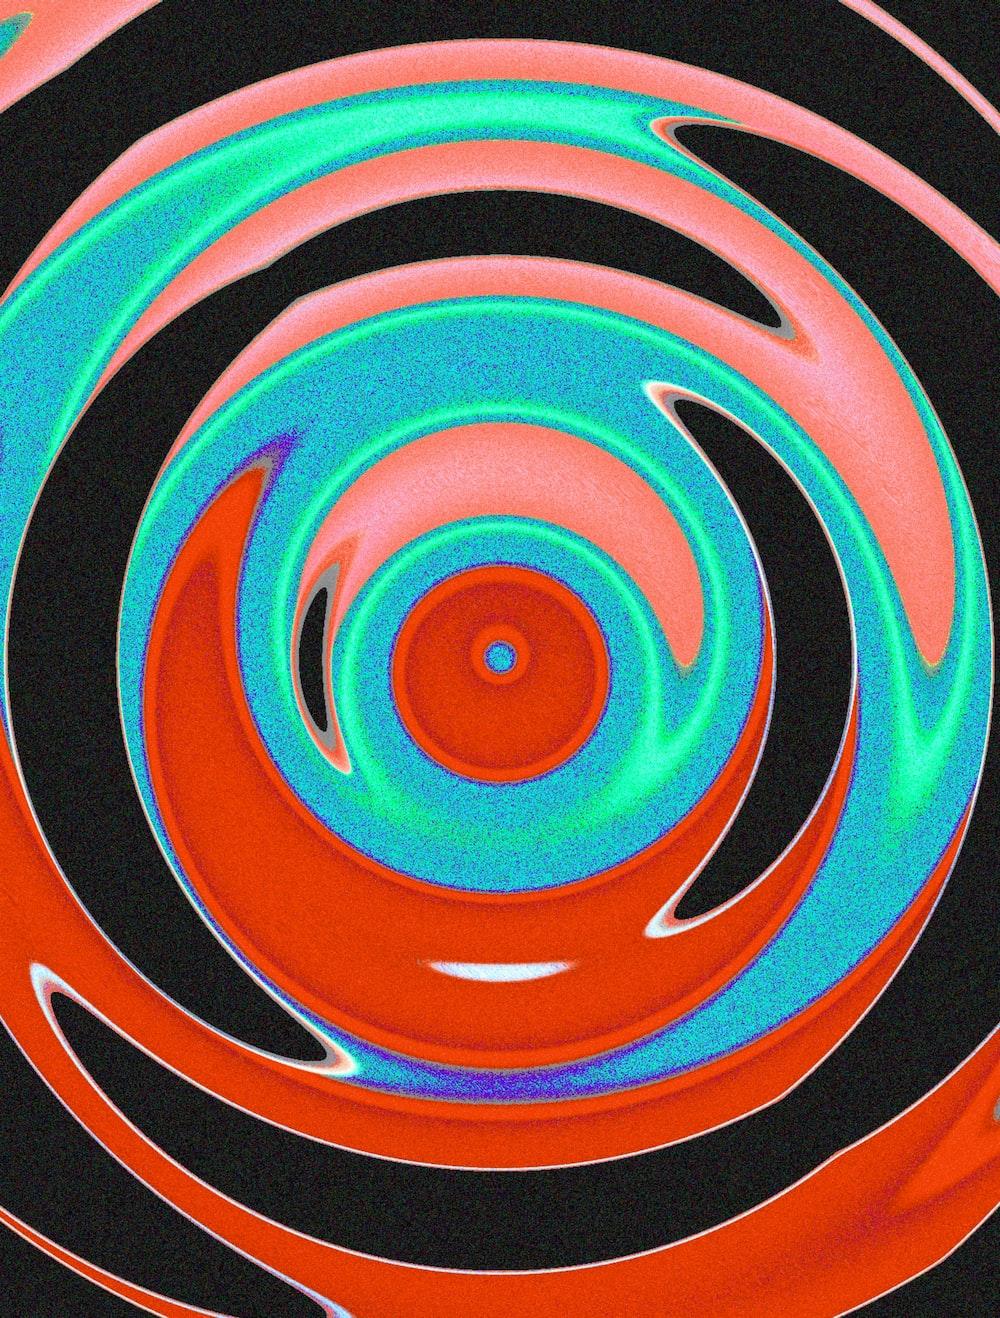 blue and white spiral illustration